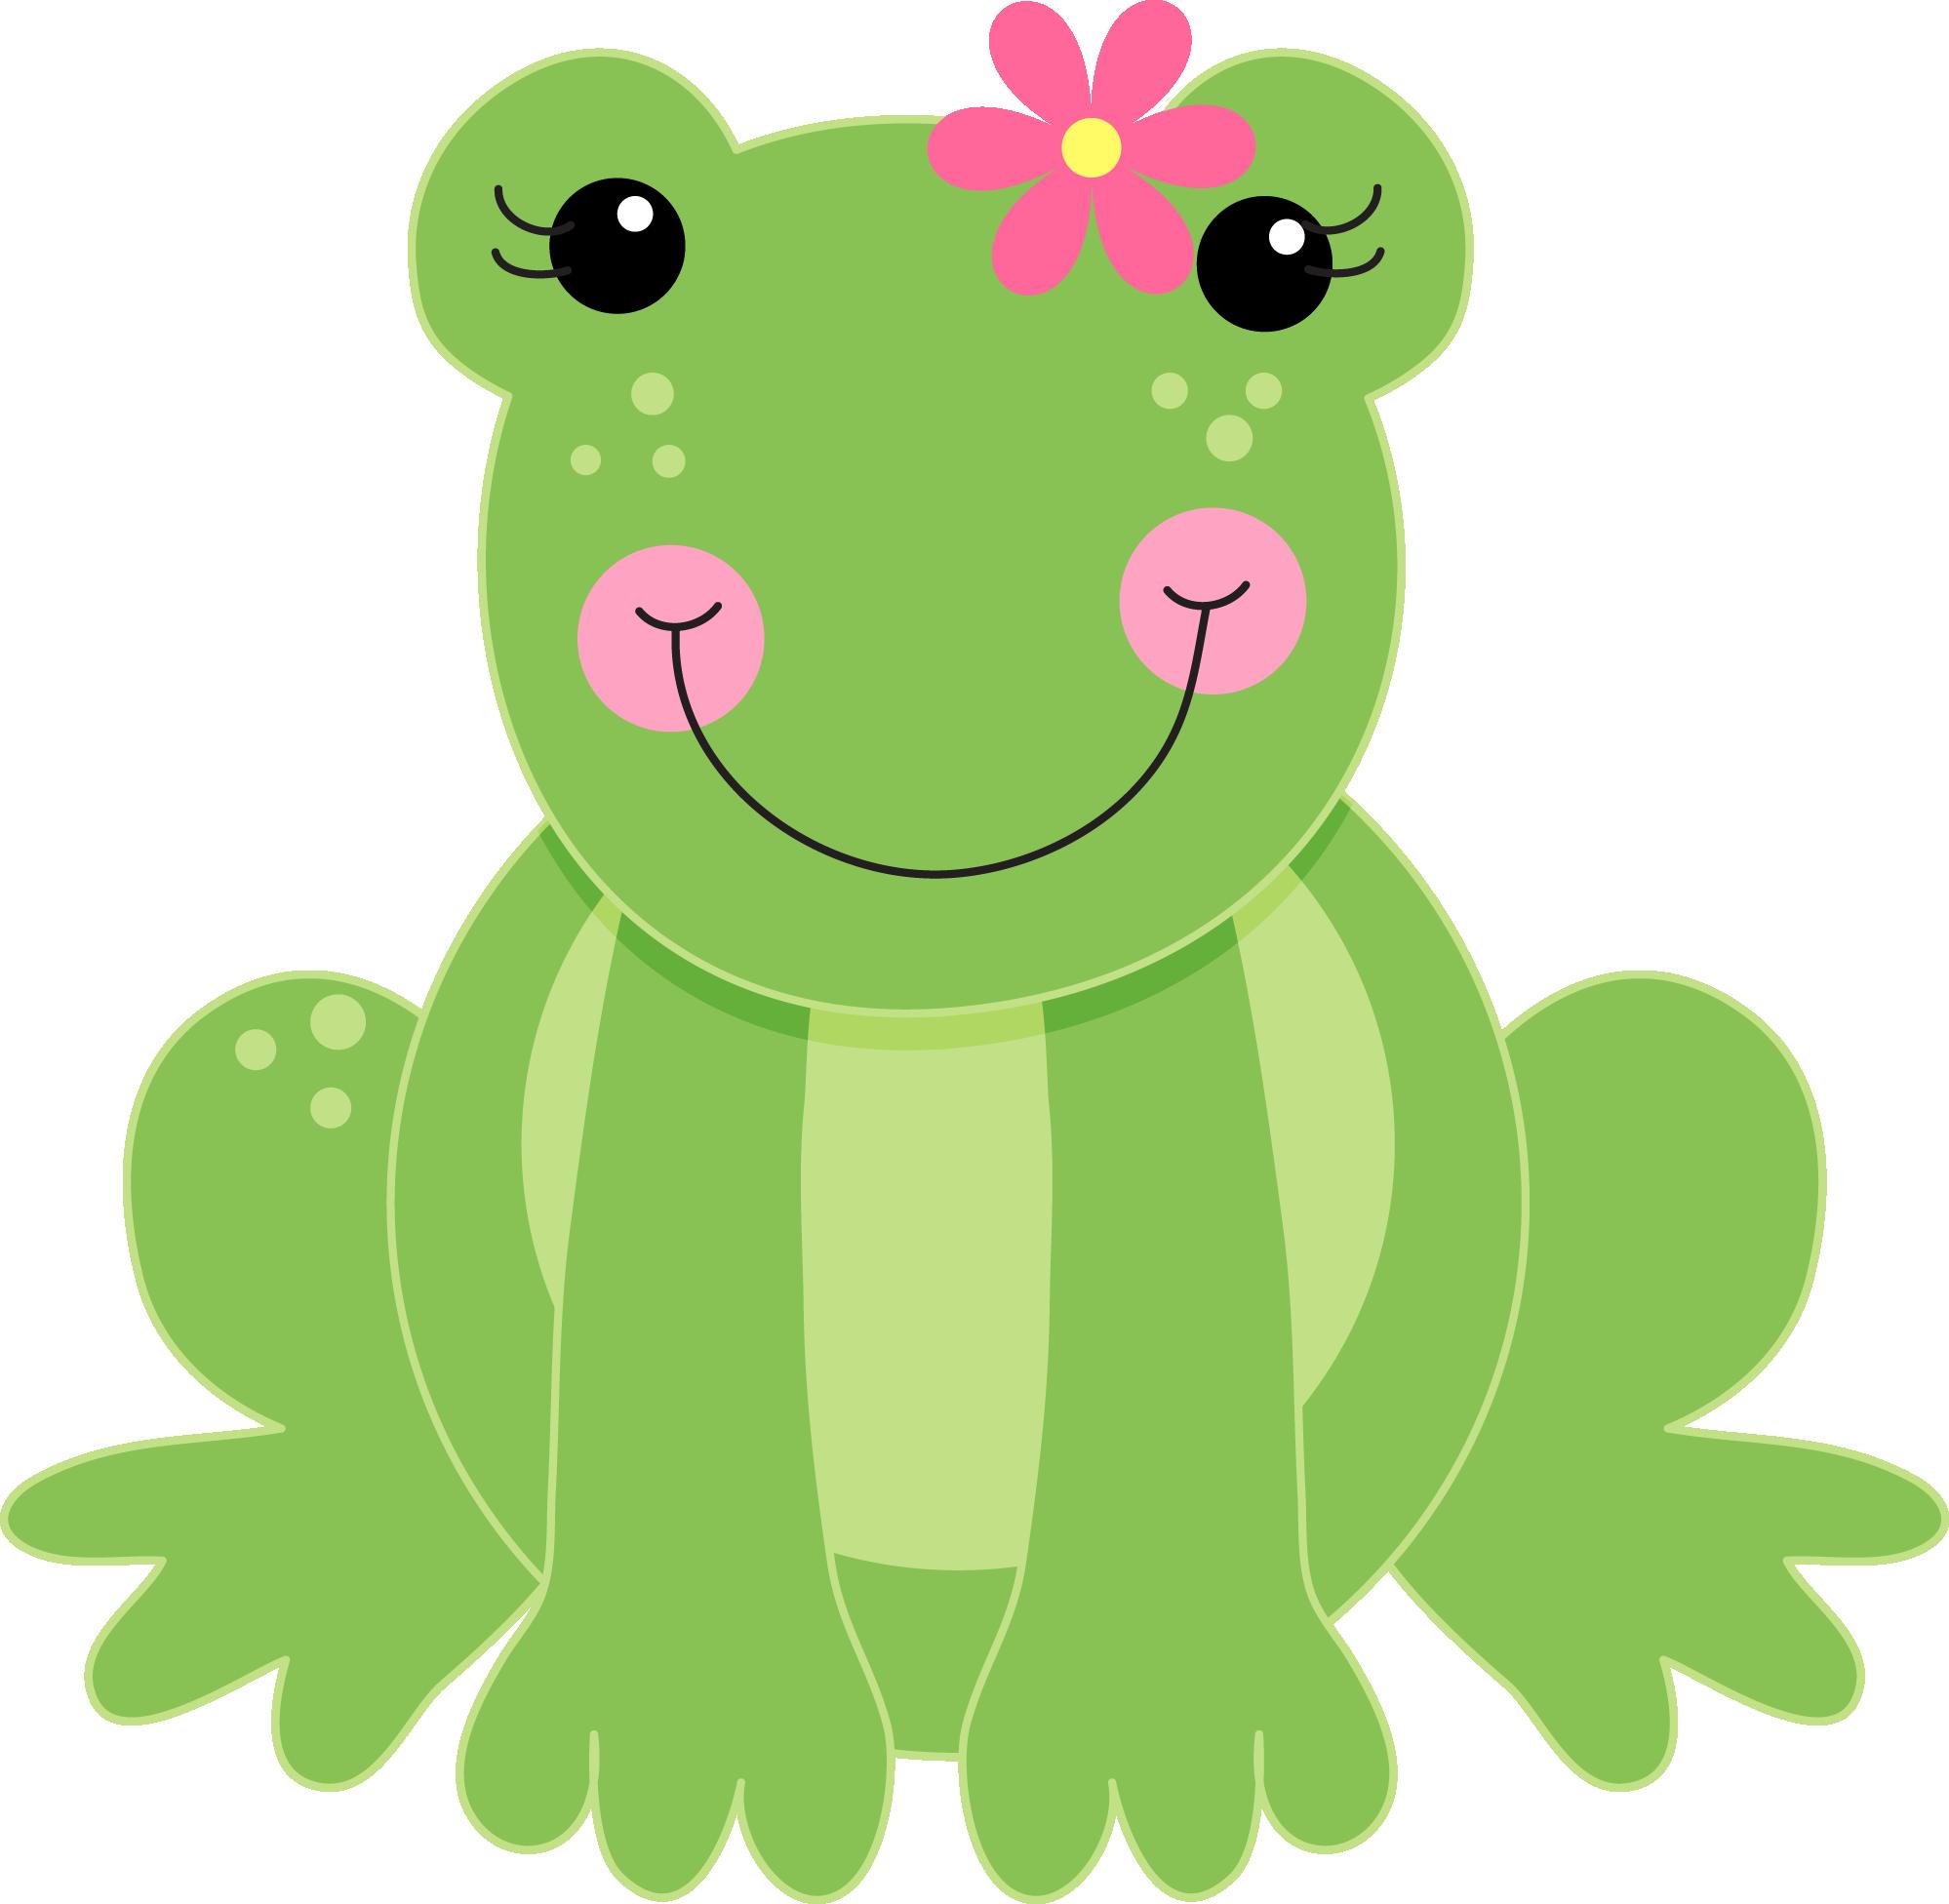 Girly clipart frog. Photo by danimfalcao minus